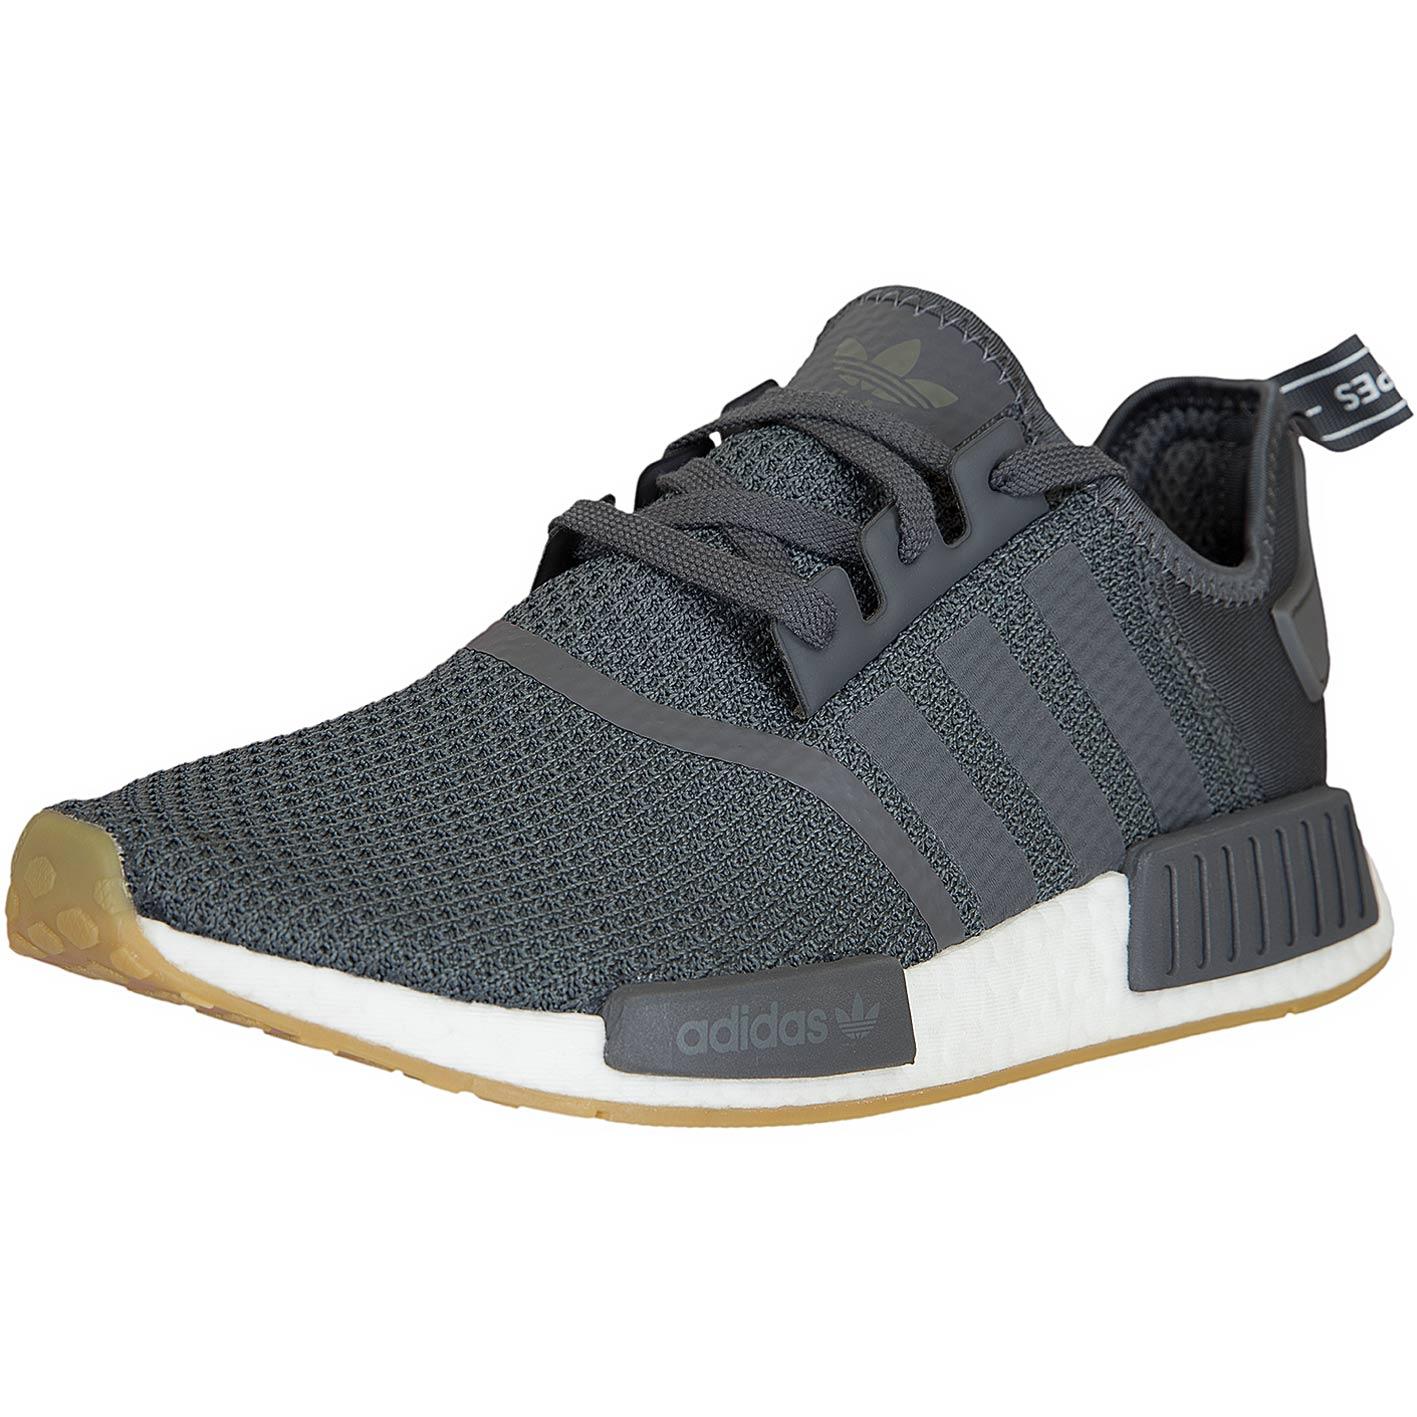 adidas nmd sneaker grau